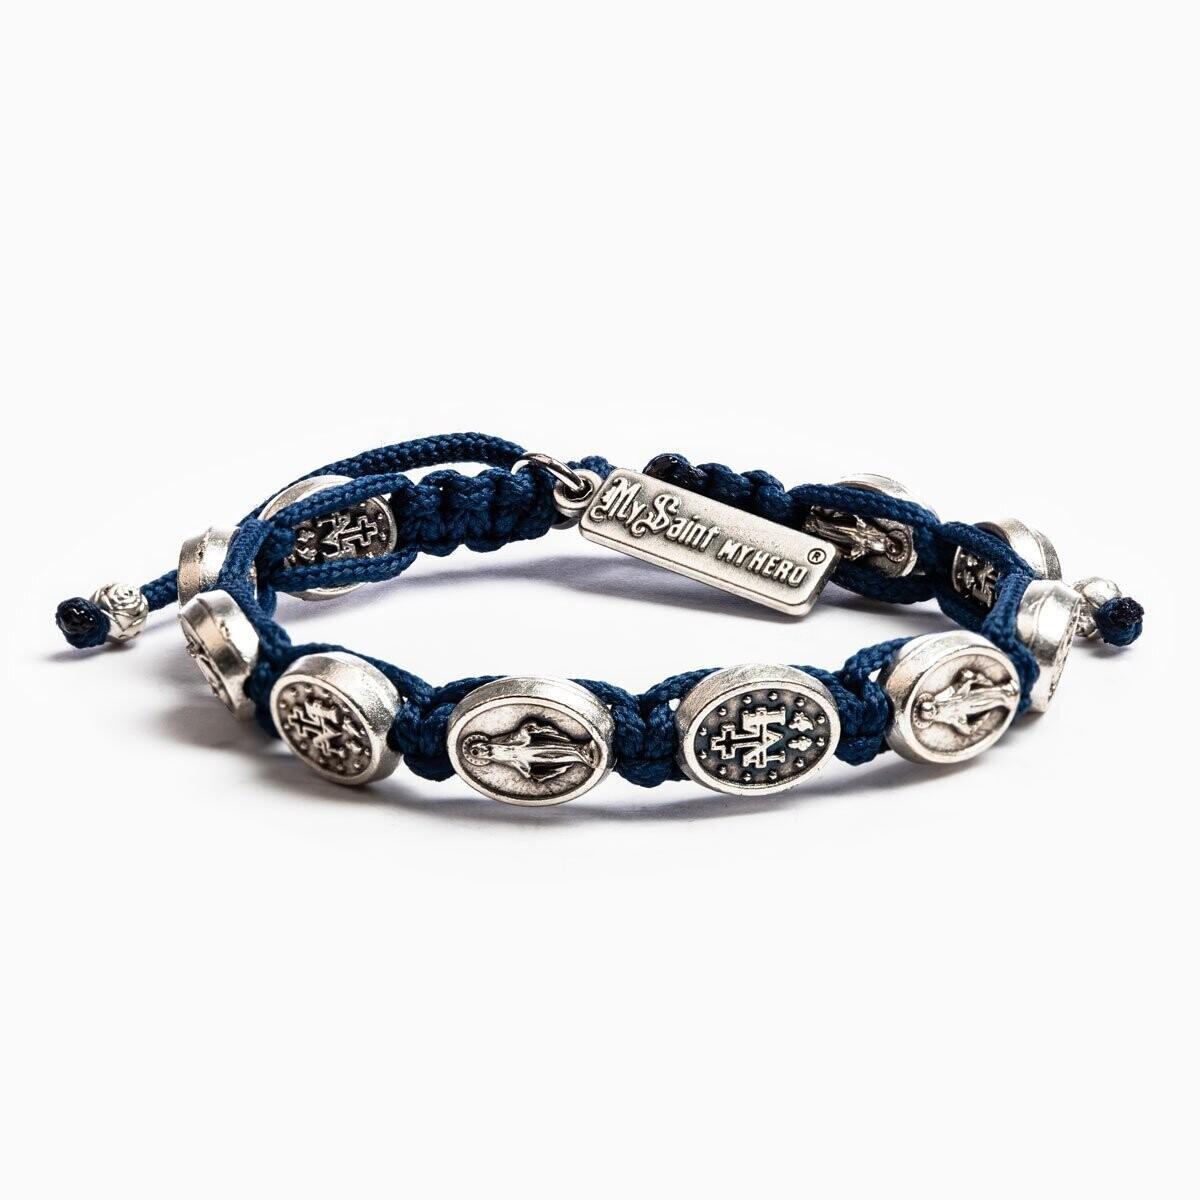 MSMH Miraculous Mary Blessing Bracelet (Silver/Navy Blue)